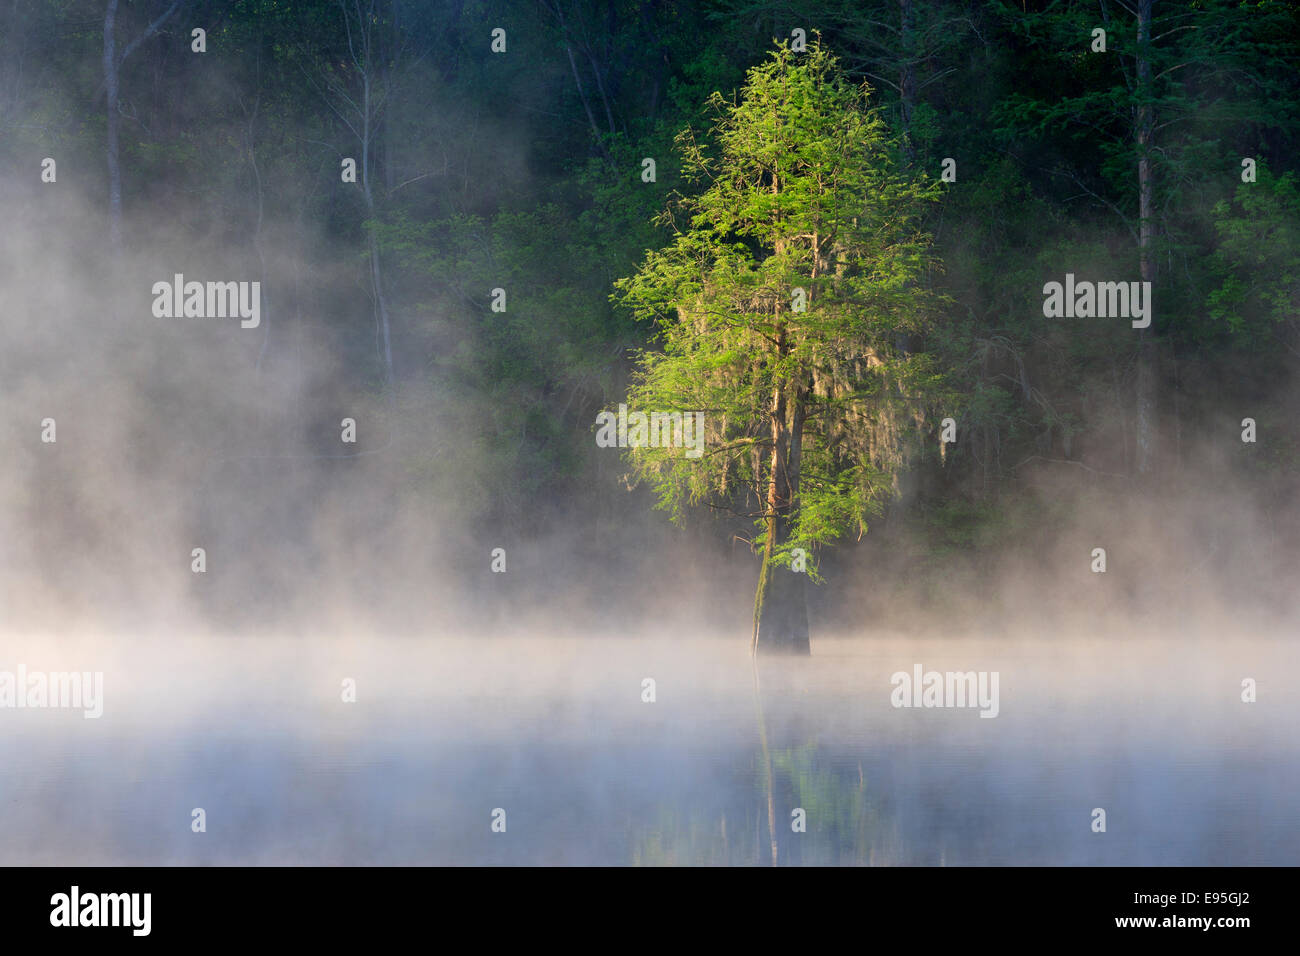 Bald Cypress draped with Spanish Moss on foggy morning. Bates Old River, Congaree National Park, South Carolina, spring. Stock Photo